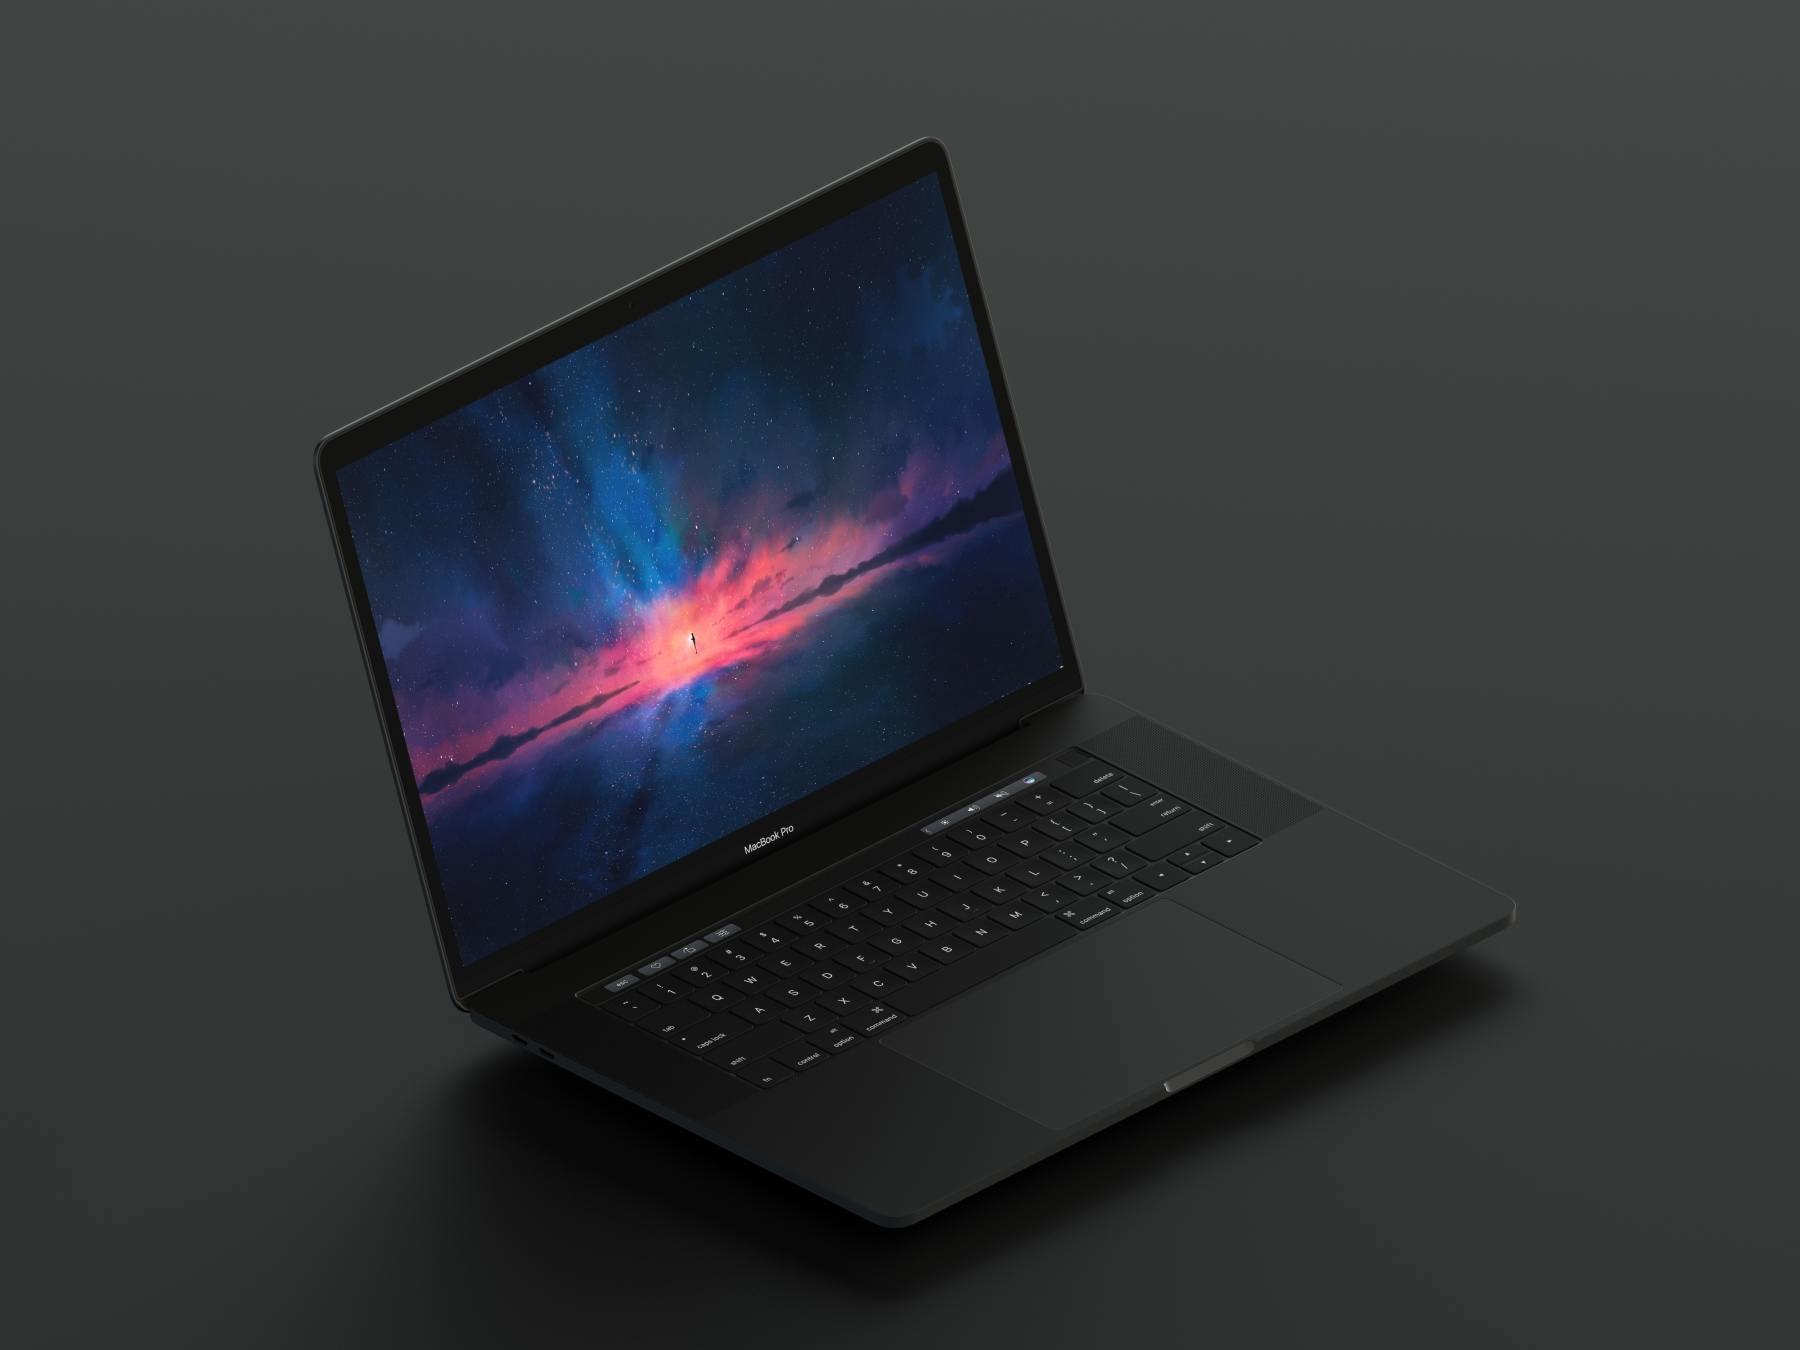 1569727881 50edda53d2490ae - 苹果Macbook UI样机